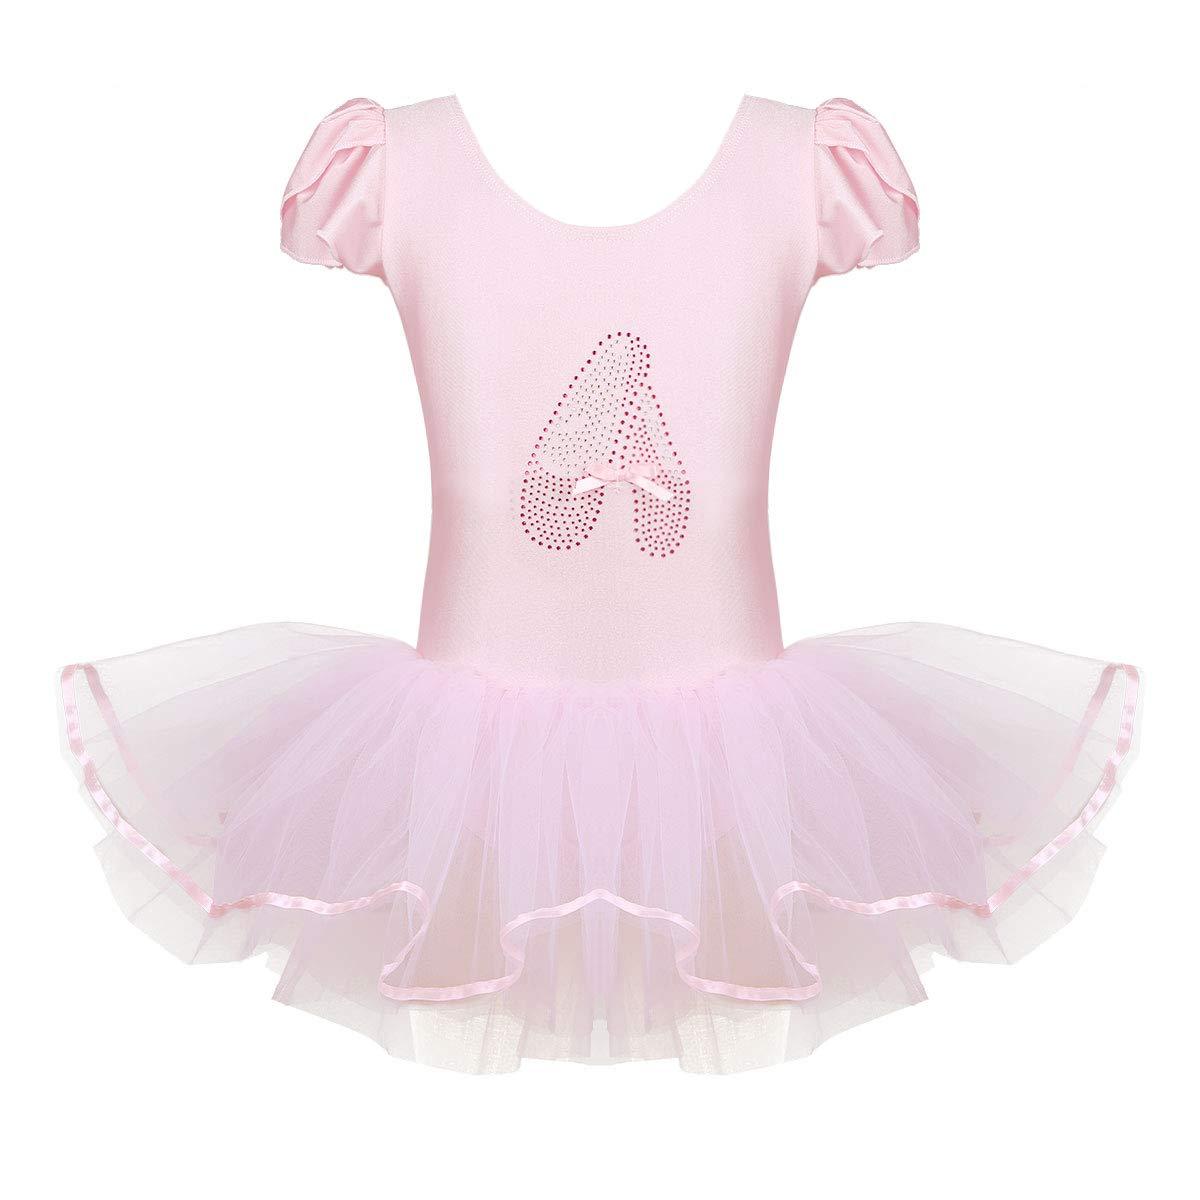 b8fa68408 Amazon.com  YiZYiF Little Girls  Princess Ruffled Mesh Ballet ...